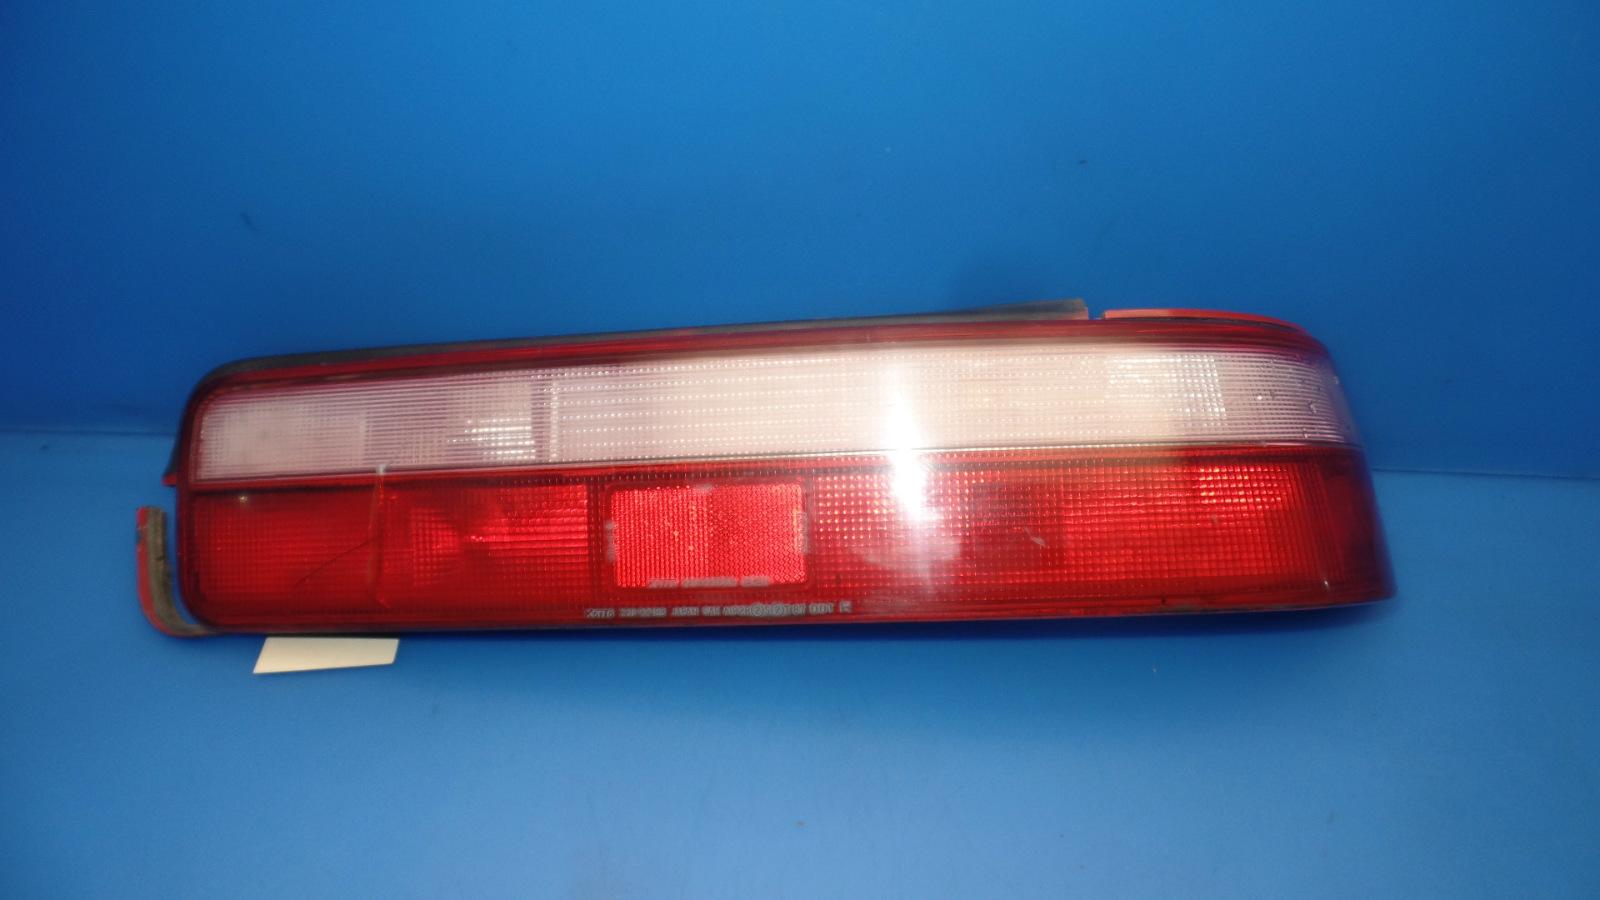 Acura Integra OEM Right Passenger Side Tail Light Door ONLY - 91 acura integra parts